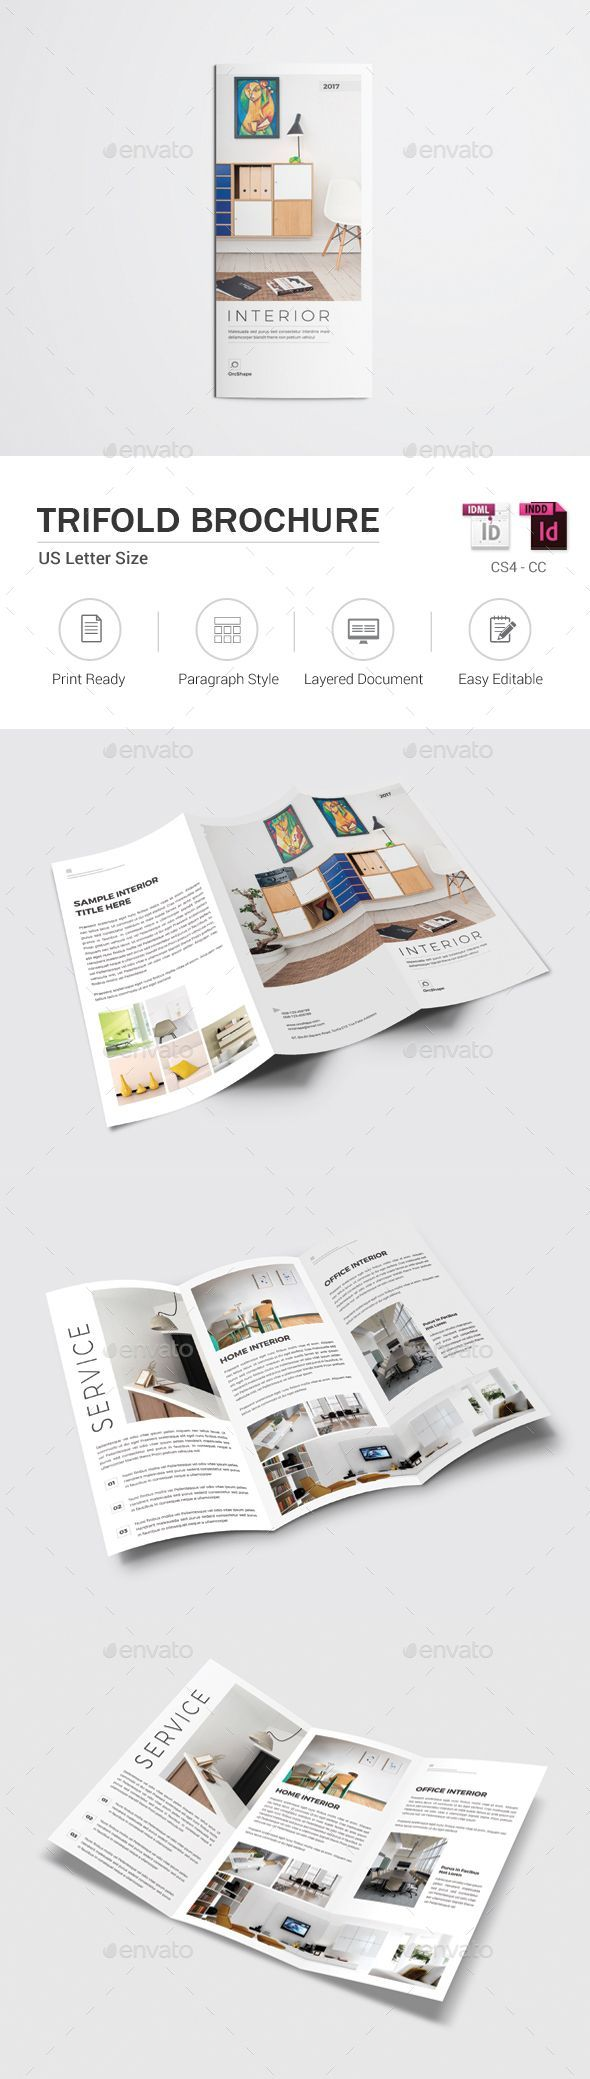 25 best ideas about furniture brochure on pinterest for Interior brochure designs